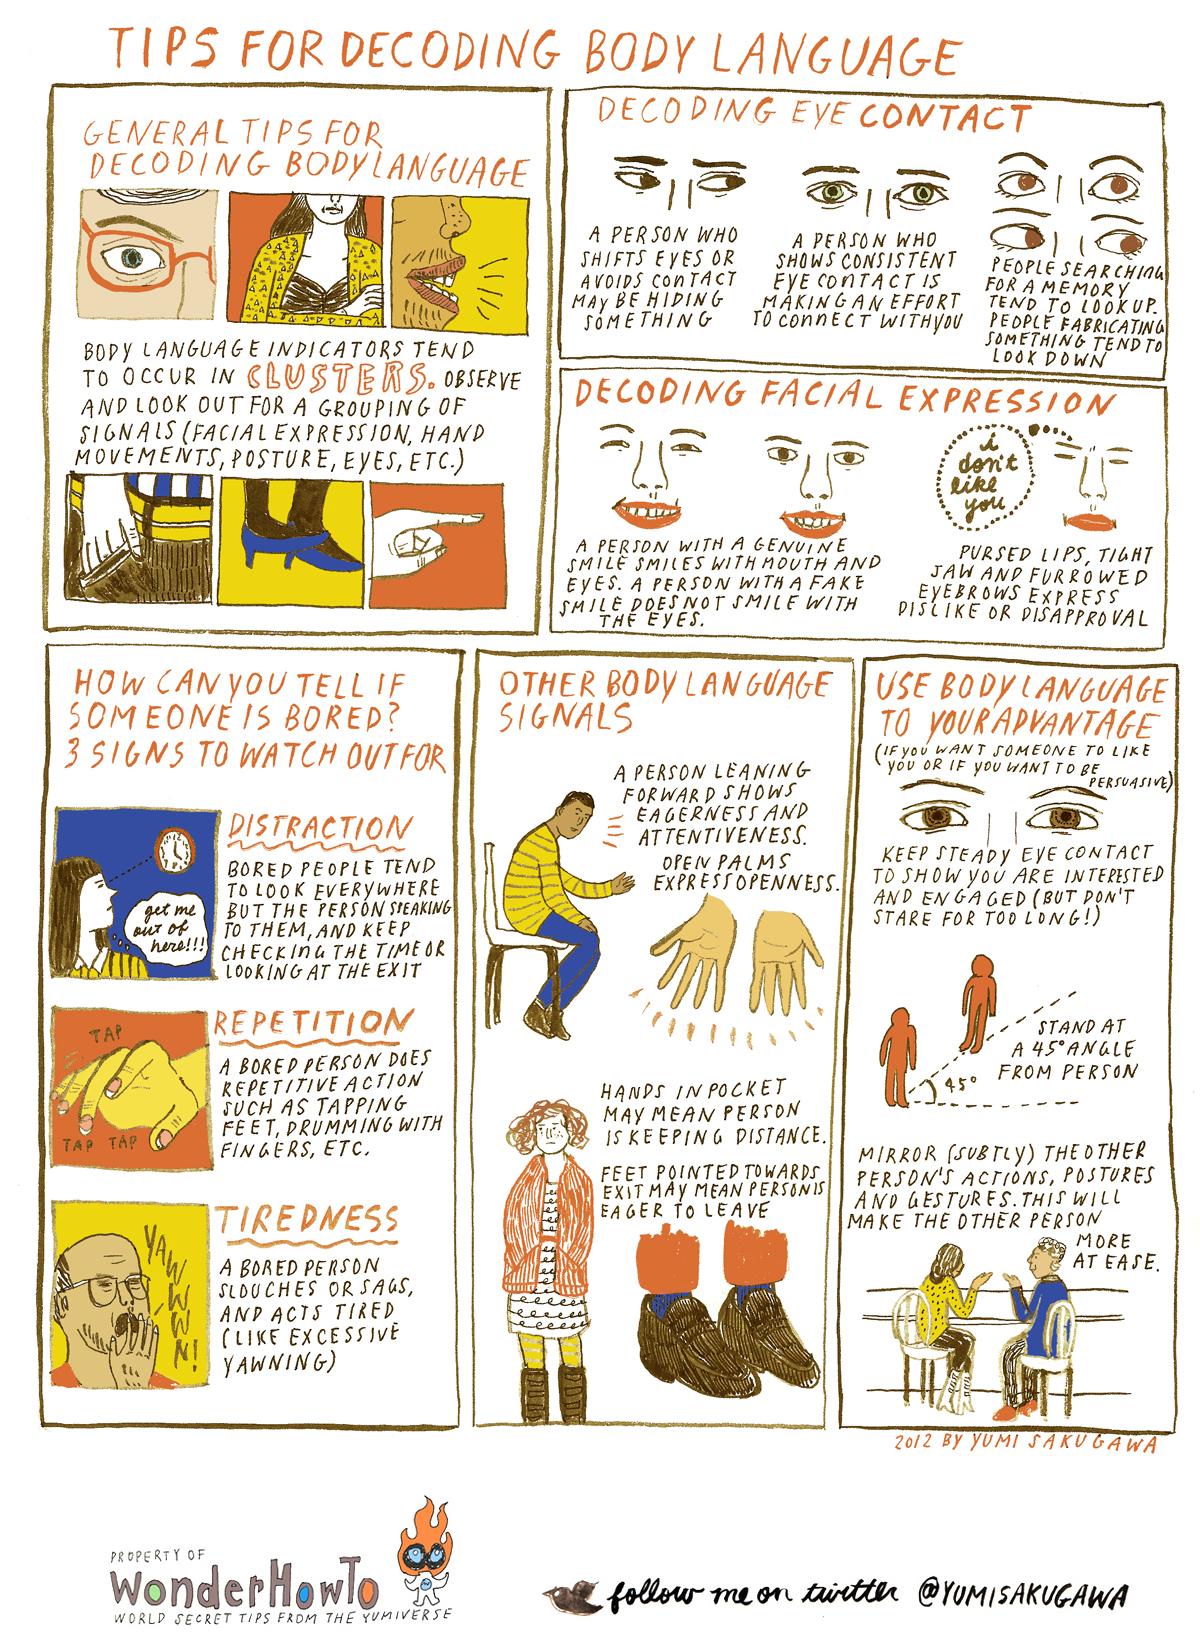 Nonverbal Communication And Body Language